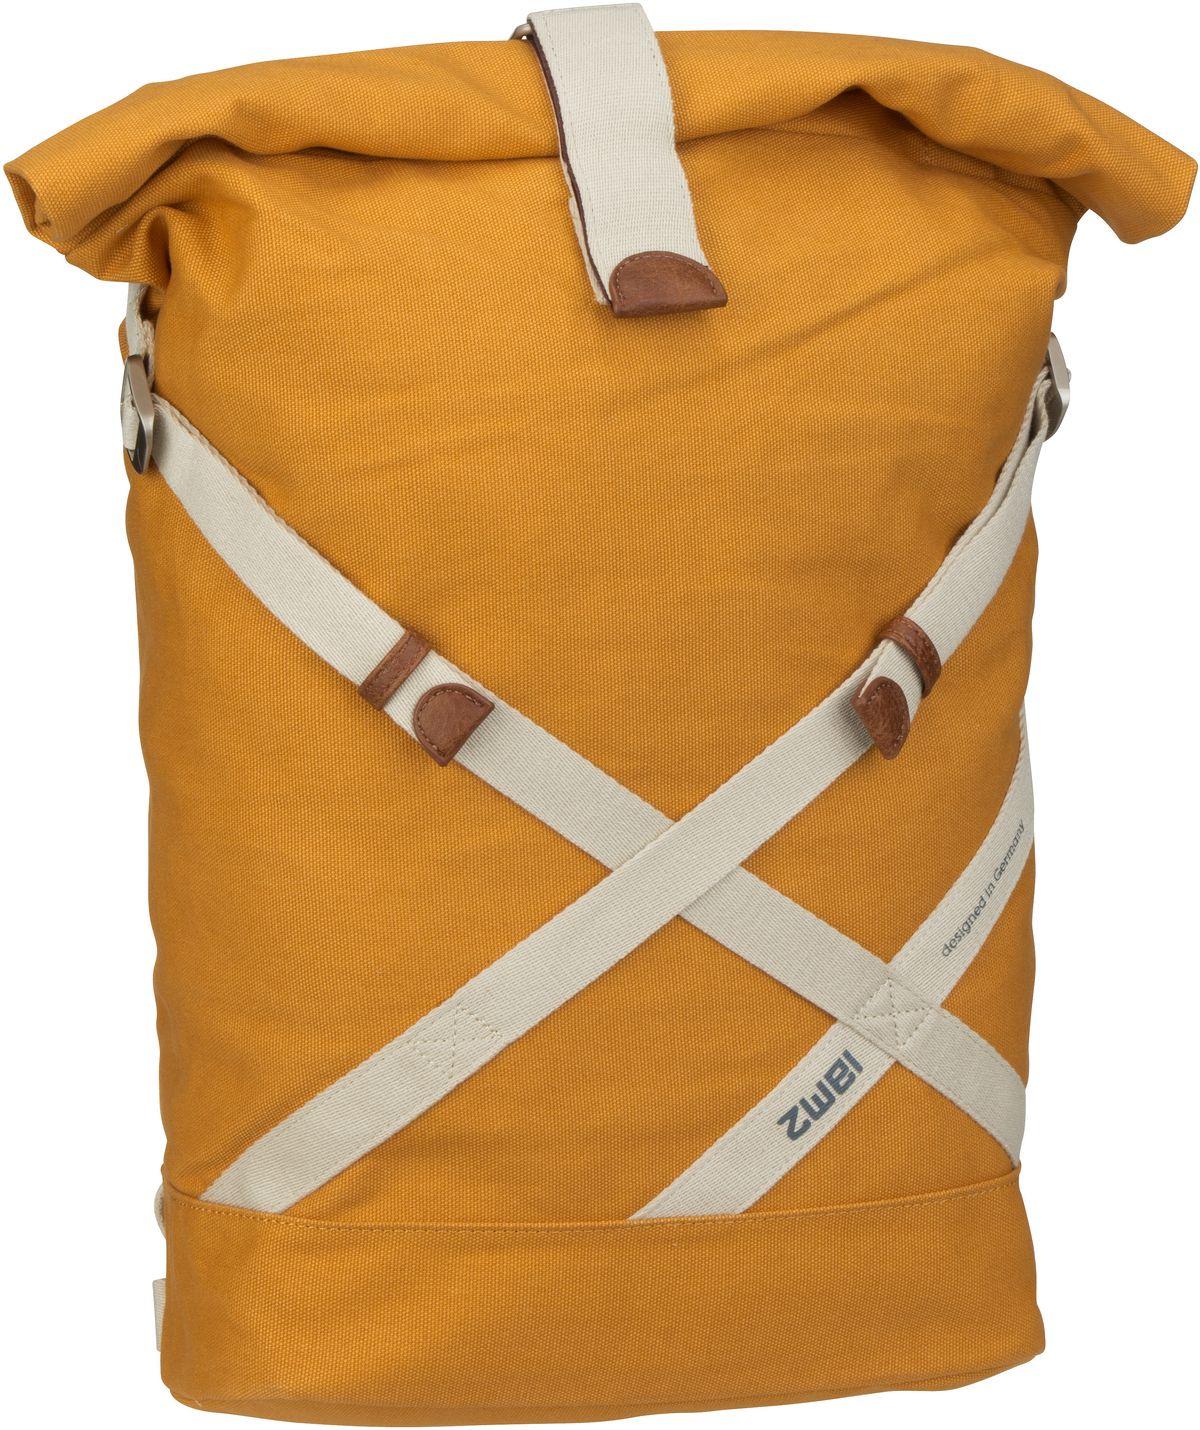 Rucksack / Daypack Yoga YR250 Yellow (17 Liter)